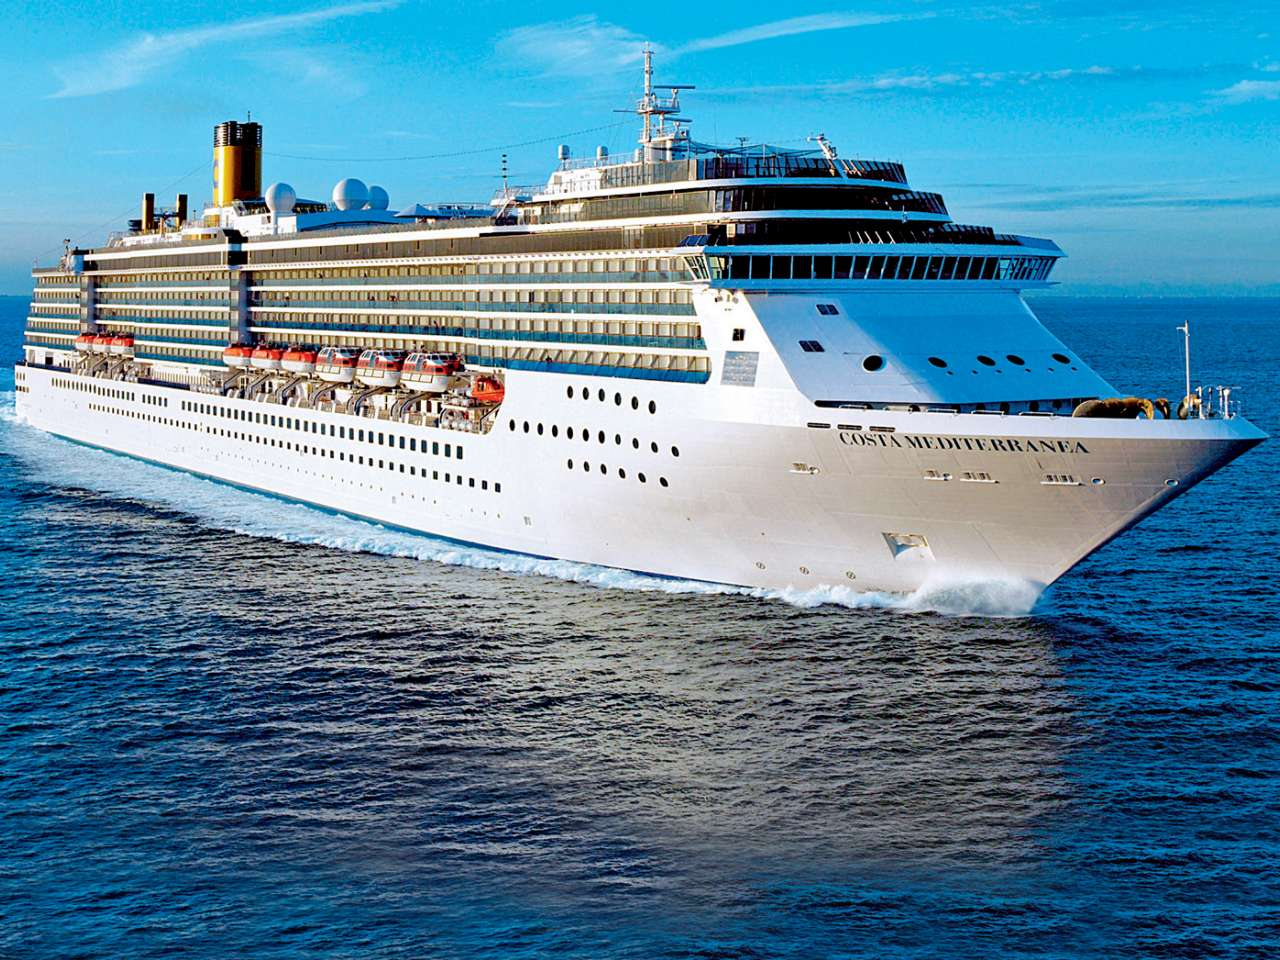 costa mediterranea flotta costa crociere